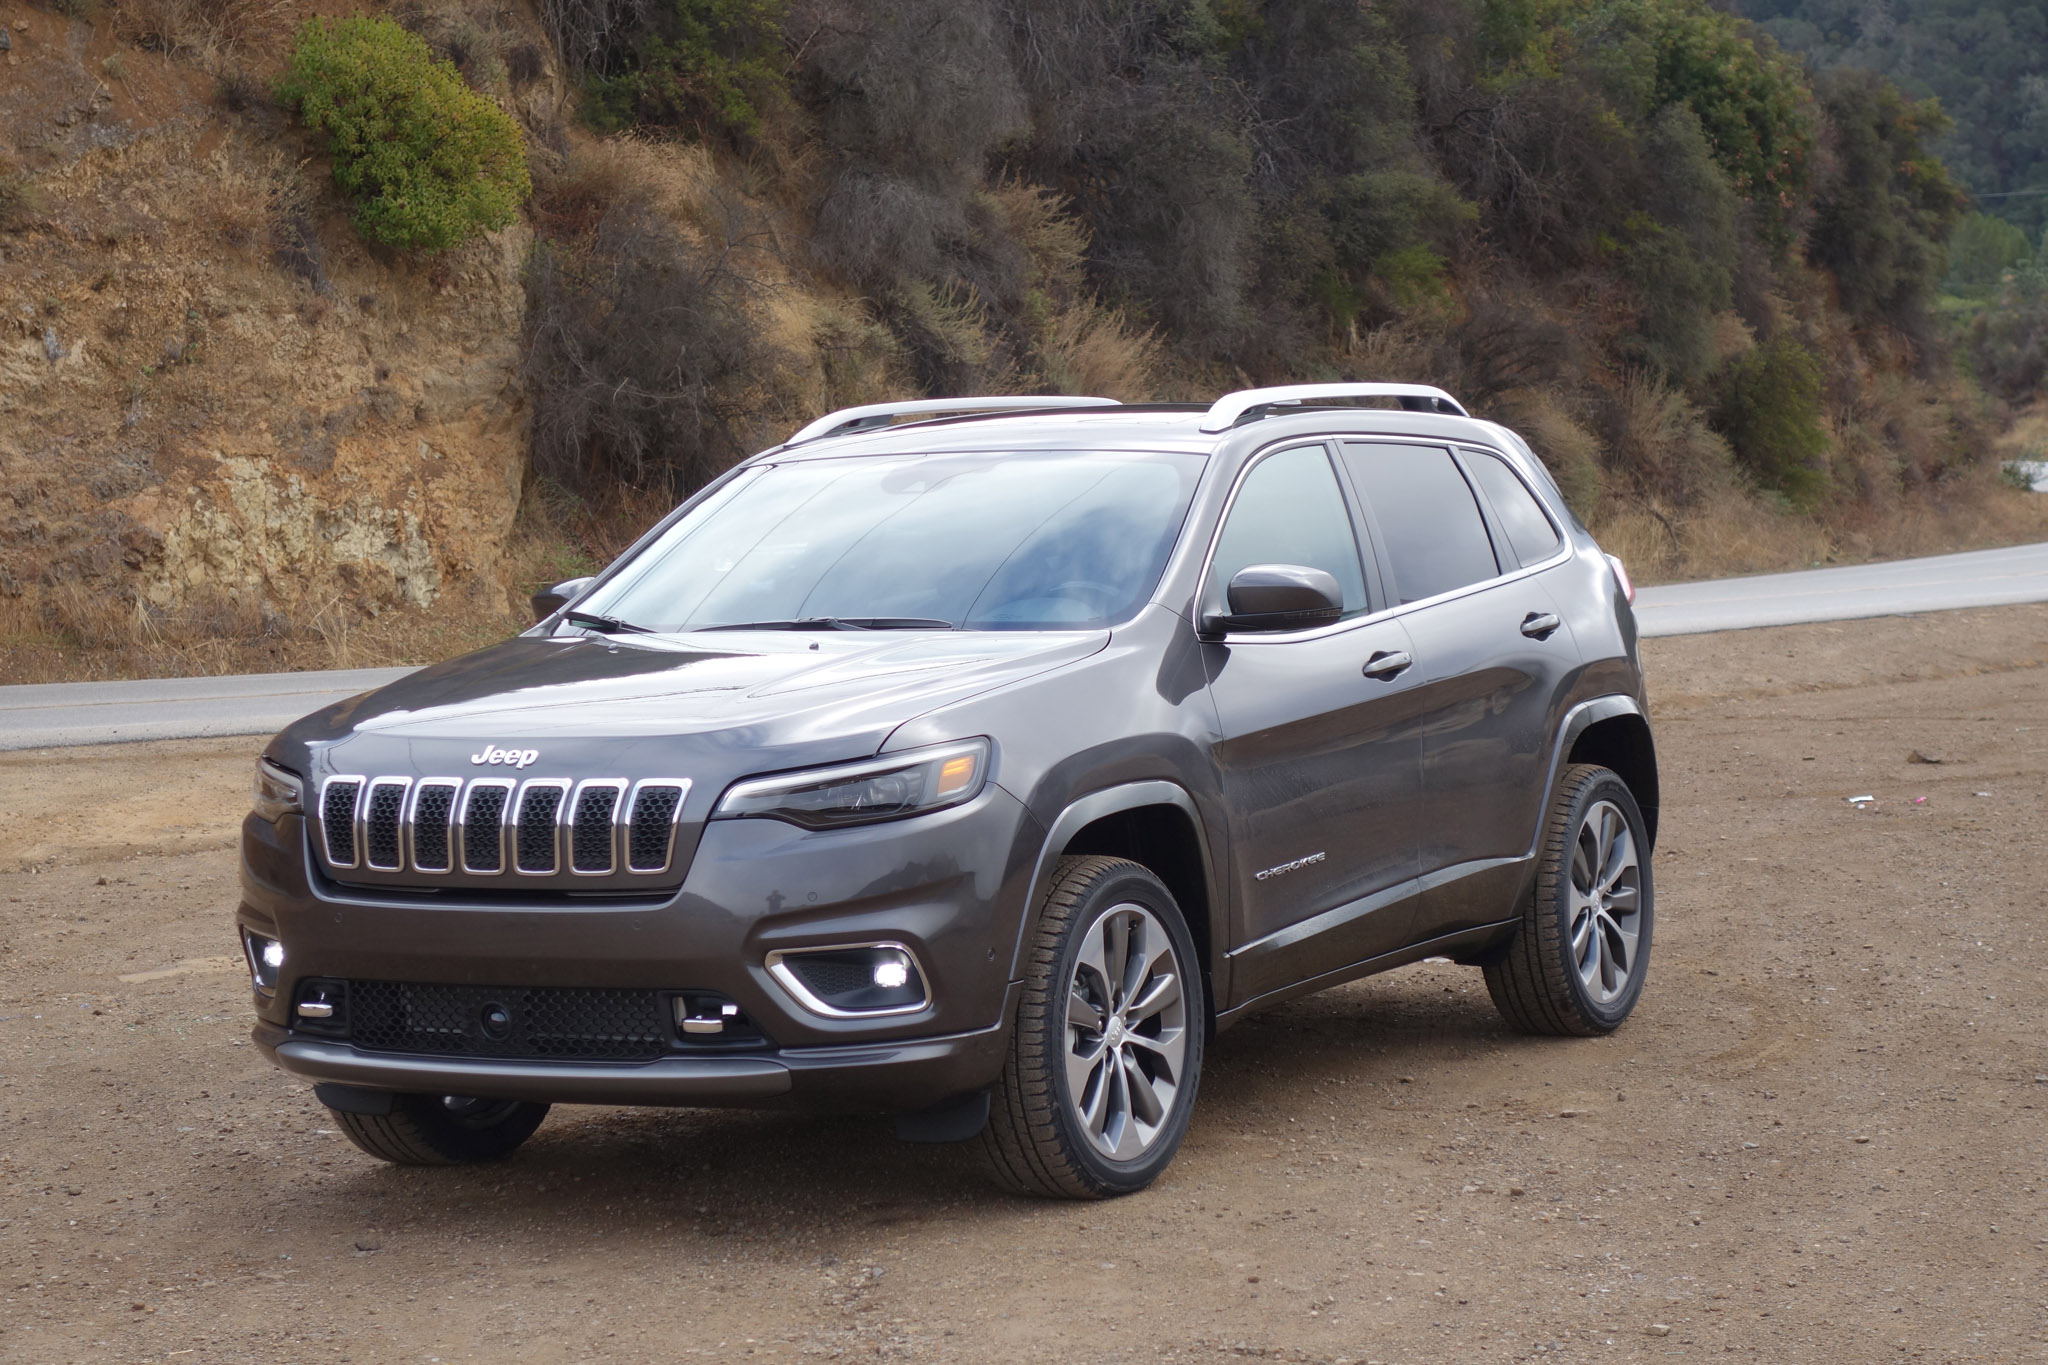 Jeep Cherokee Towing Capacity >> Jeep Cherokee 2019